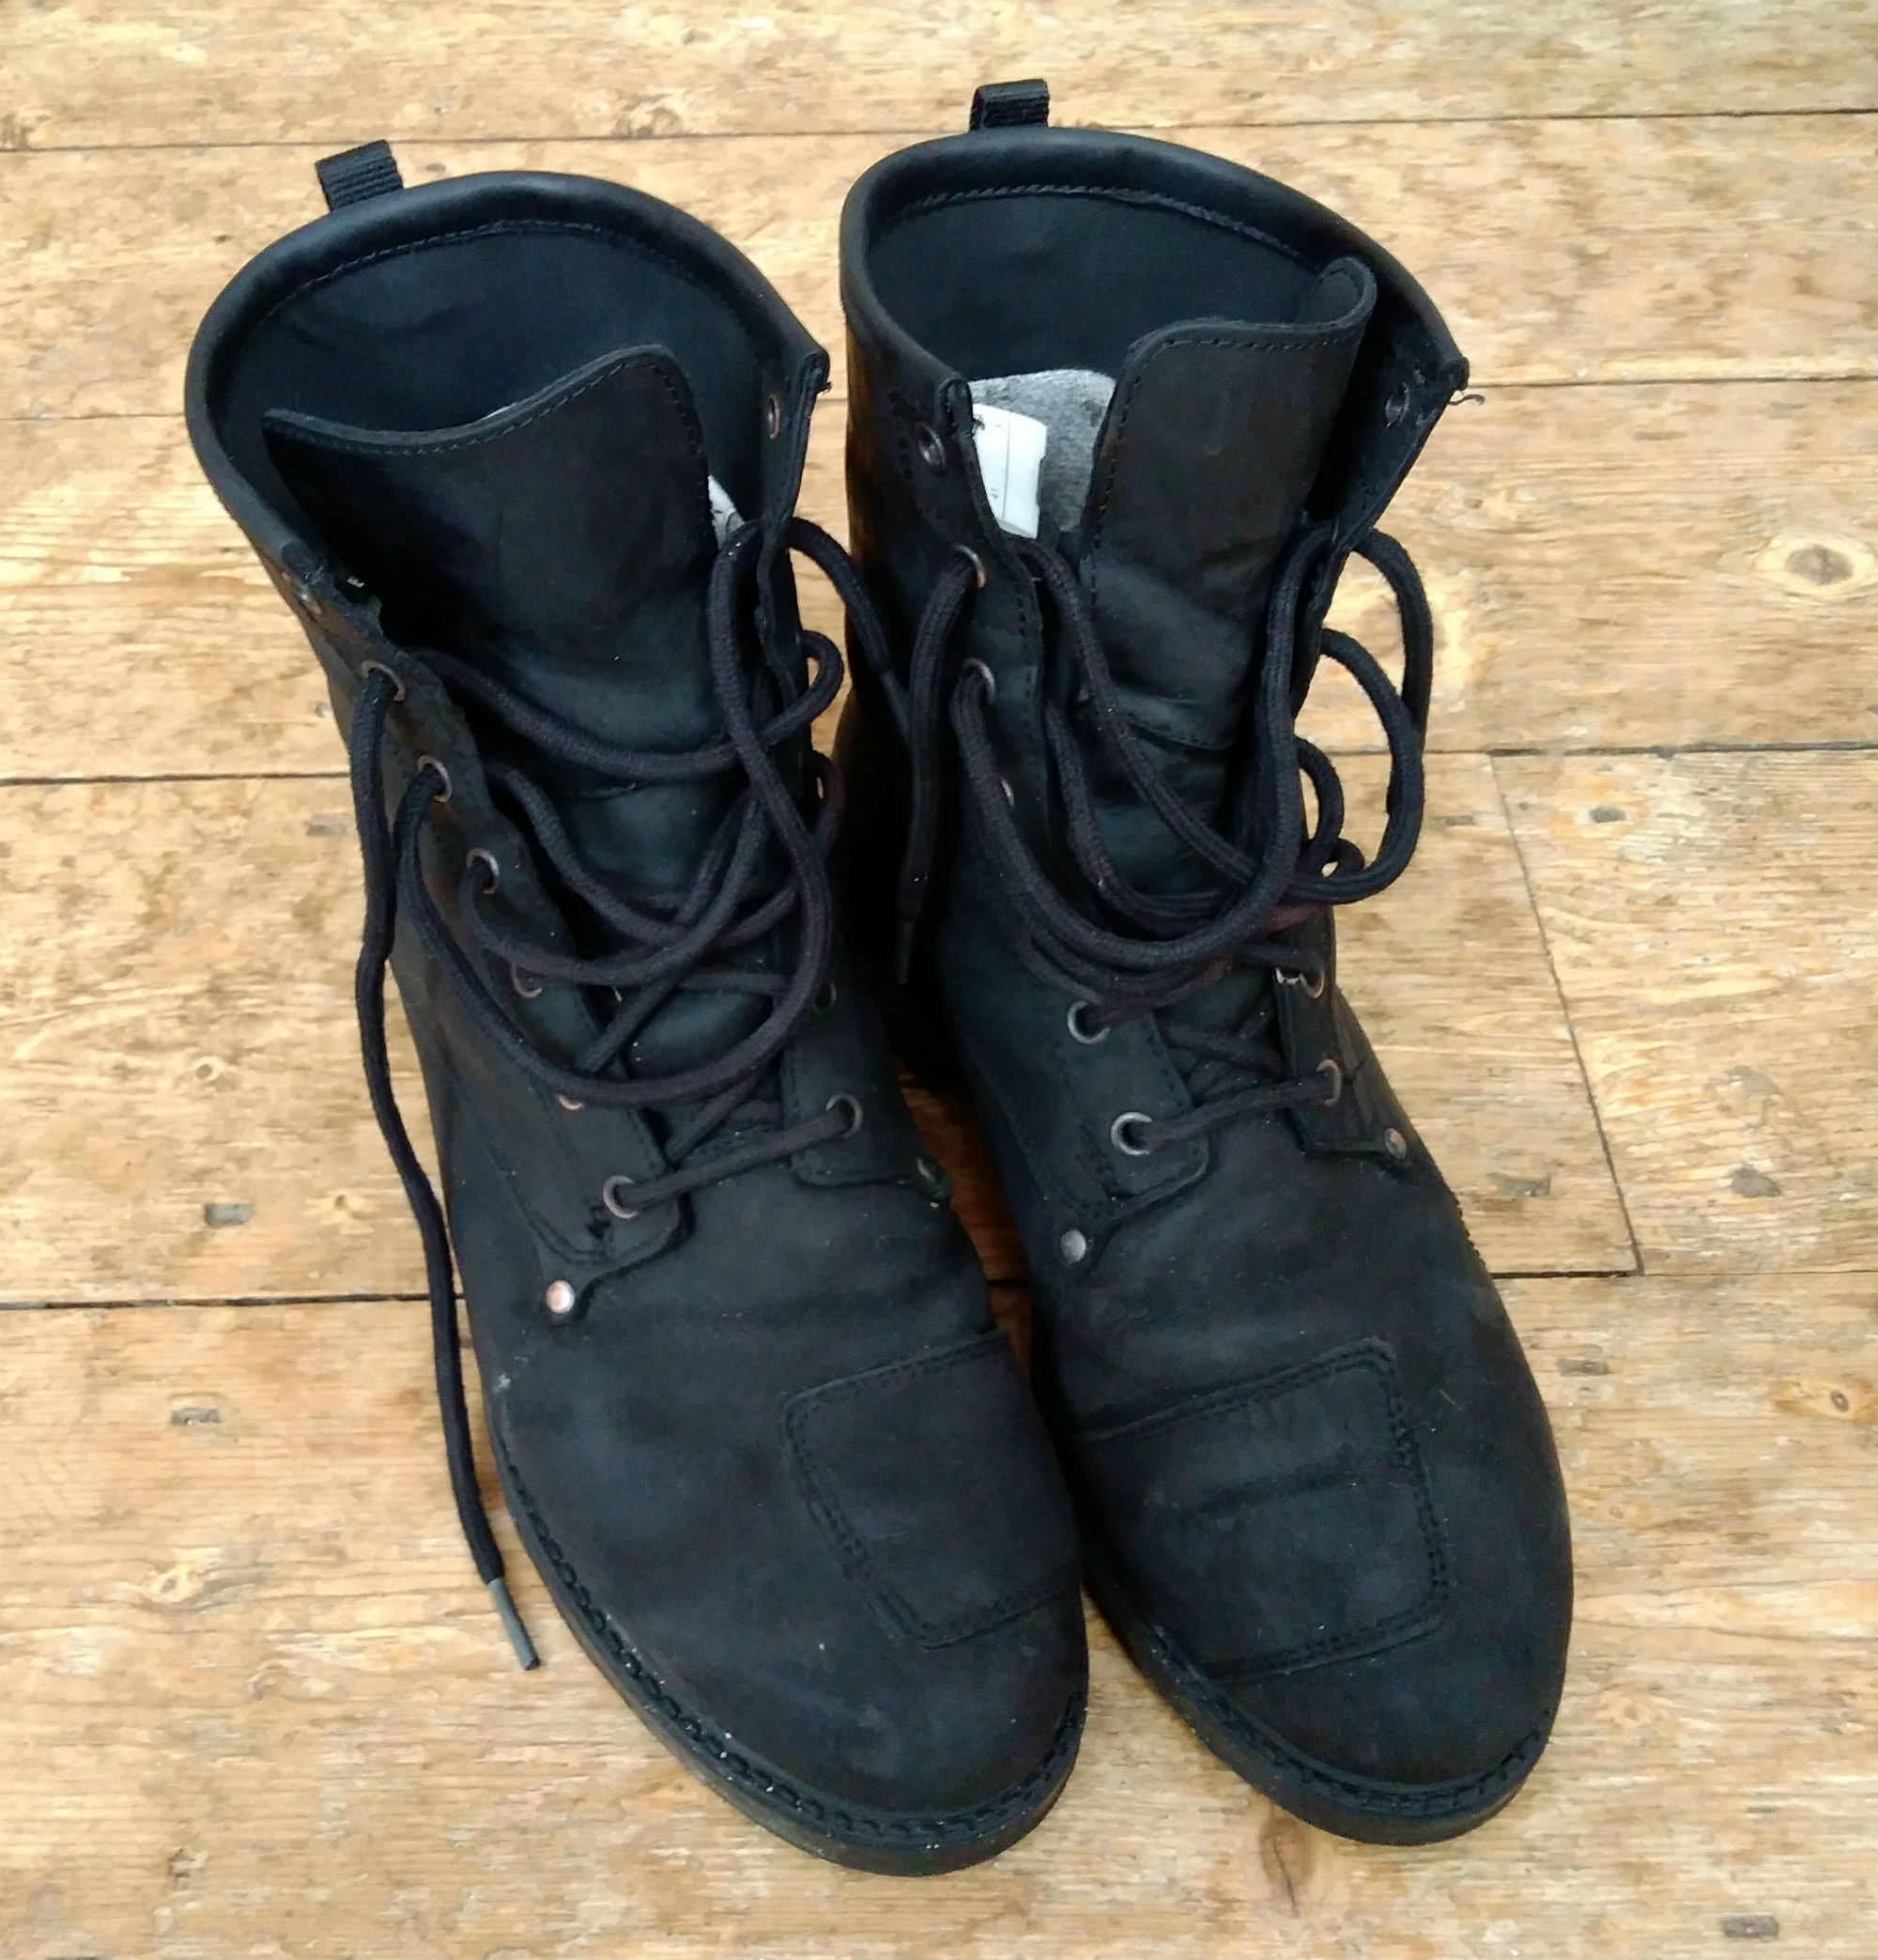 TCX X-Blend waterproof boots review